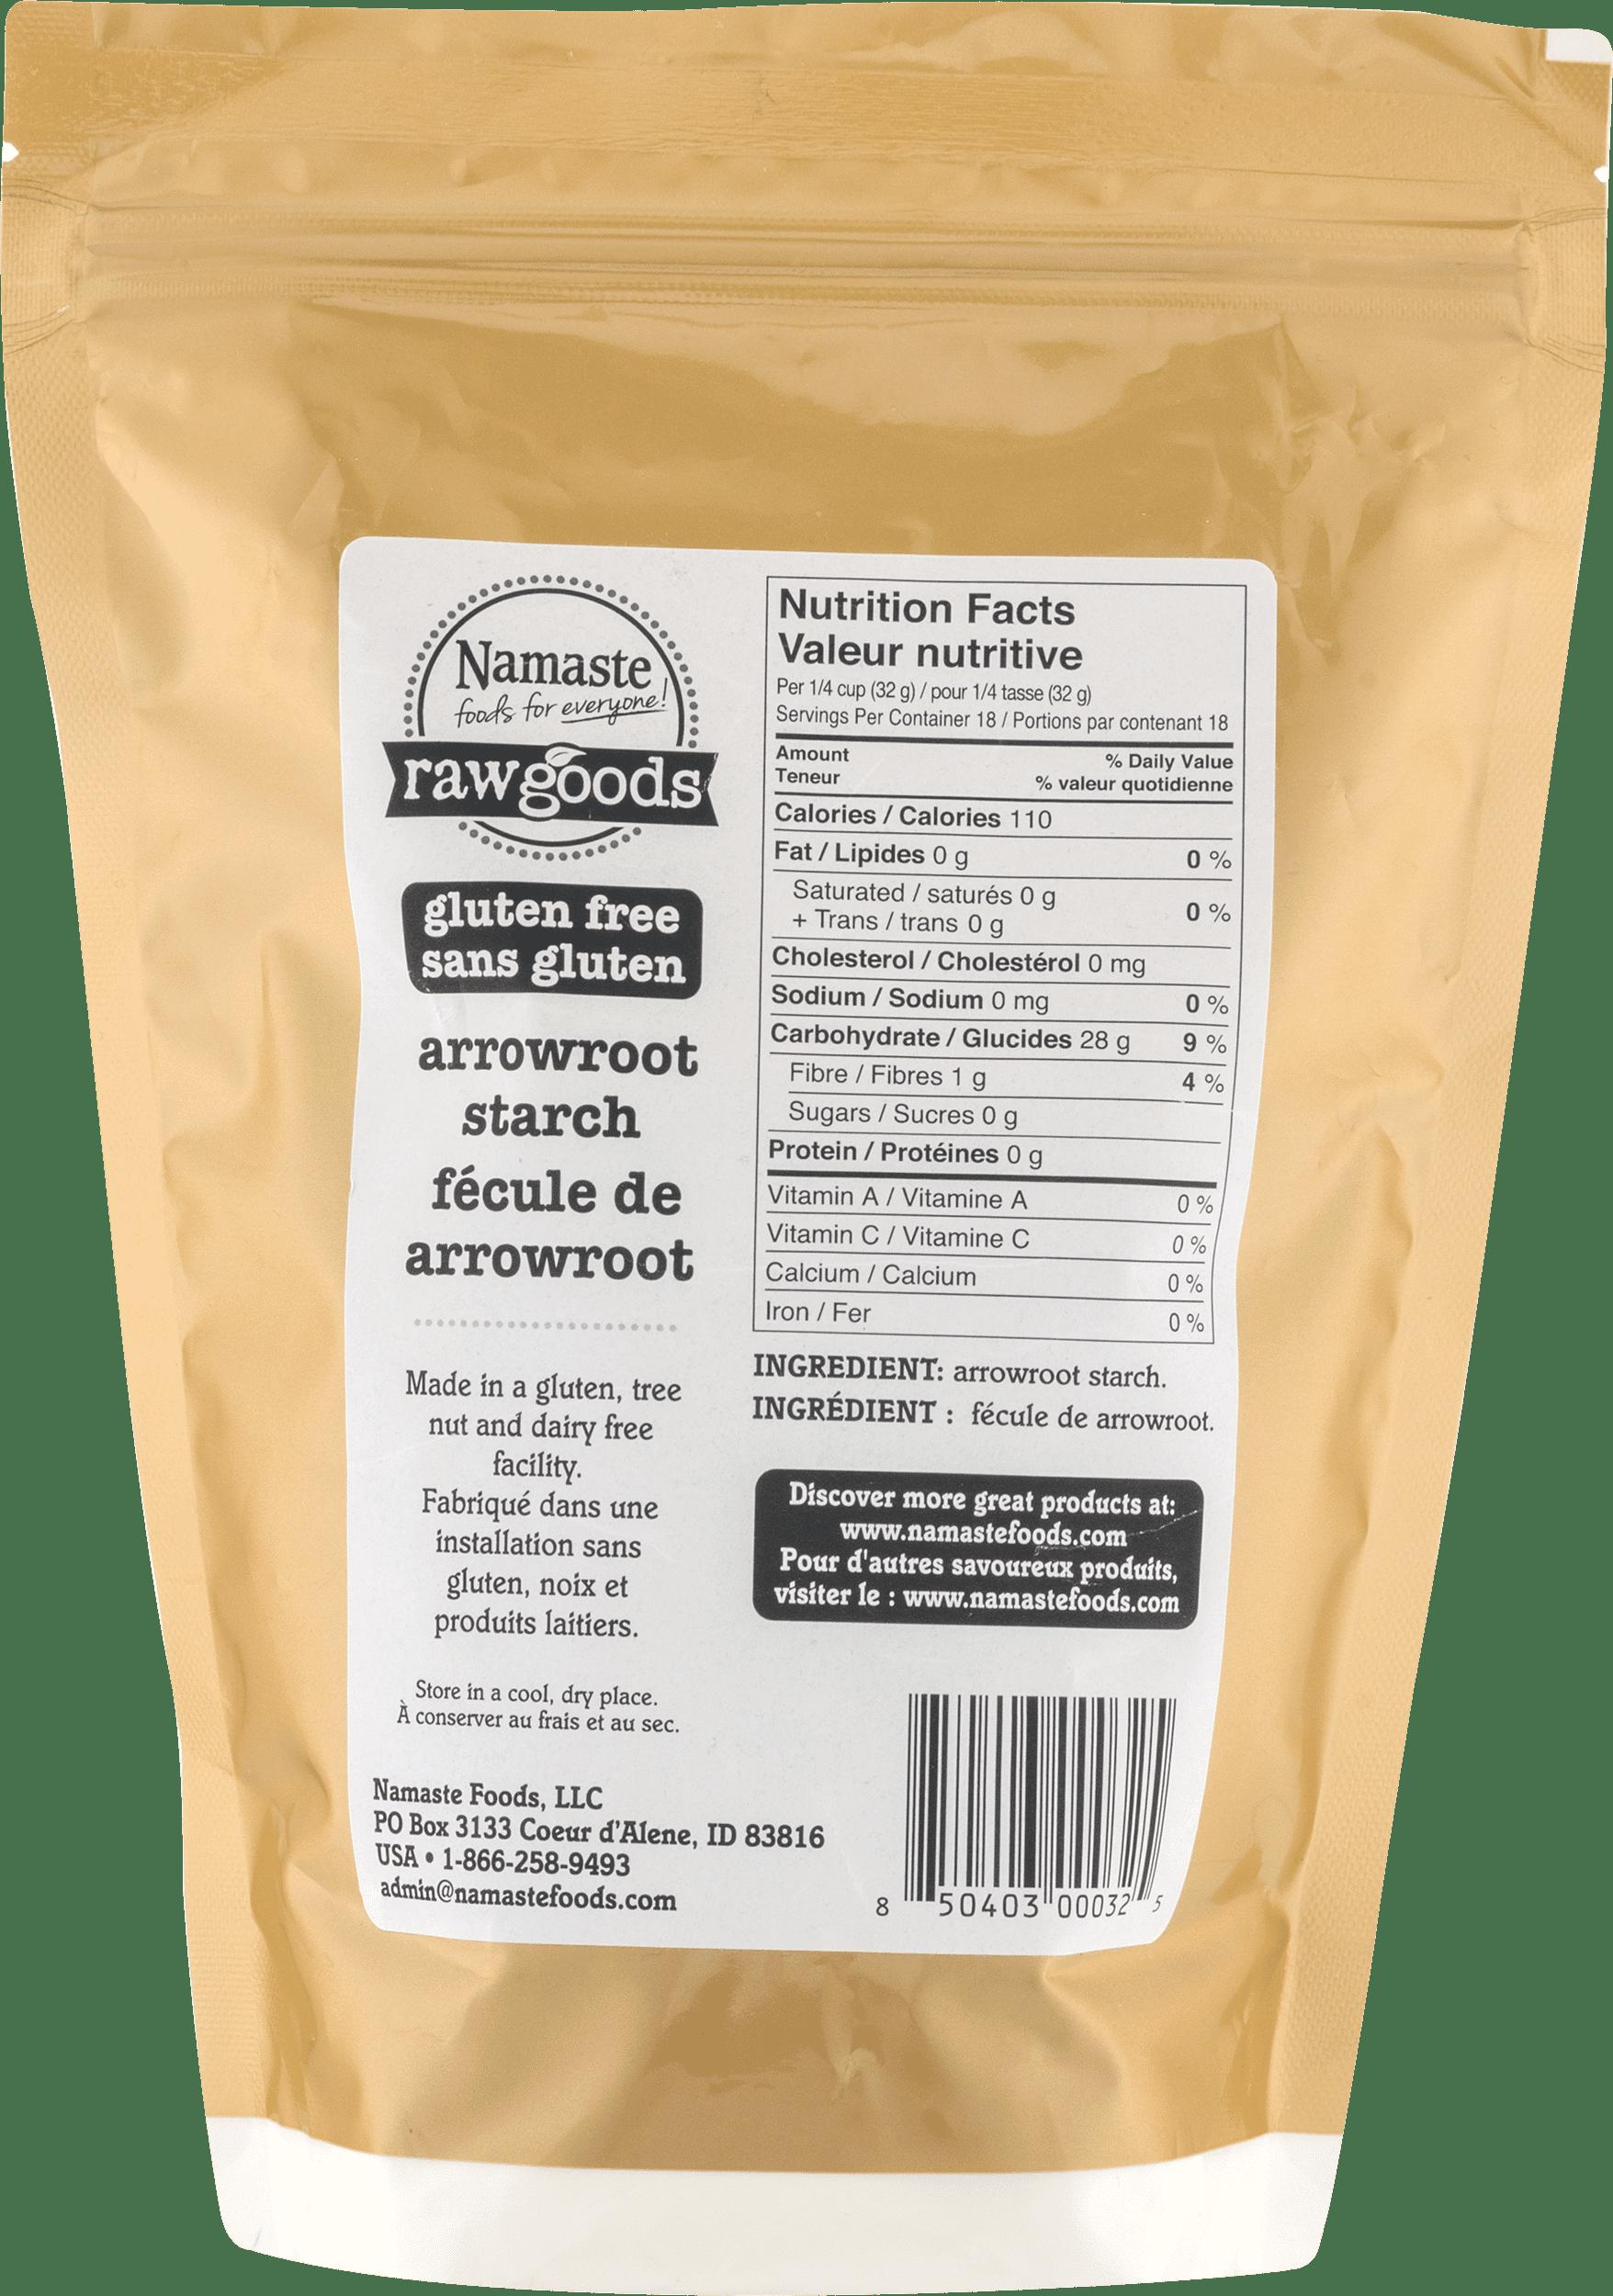 Namaste Foods Raw Goods Gluten Free Arrowroot Starch, 20 oz - Walmart.com